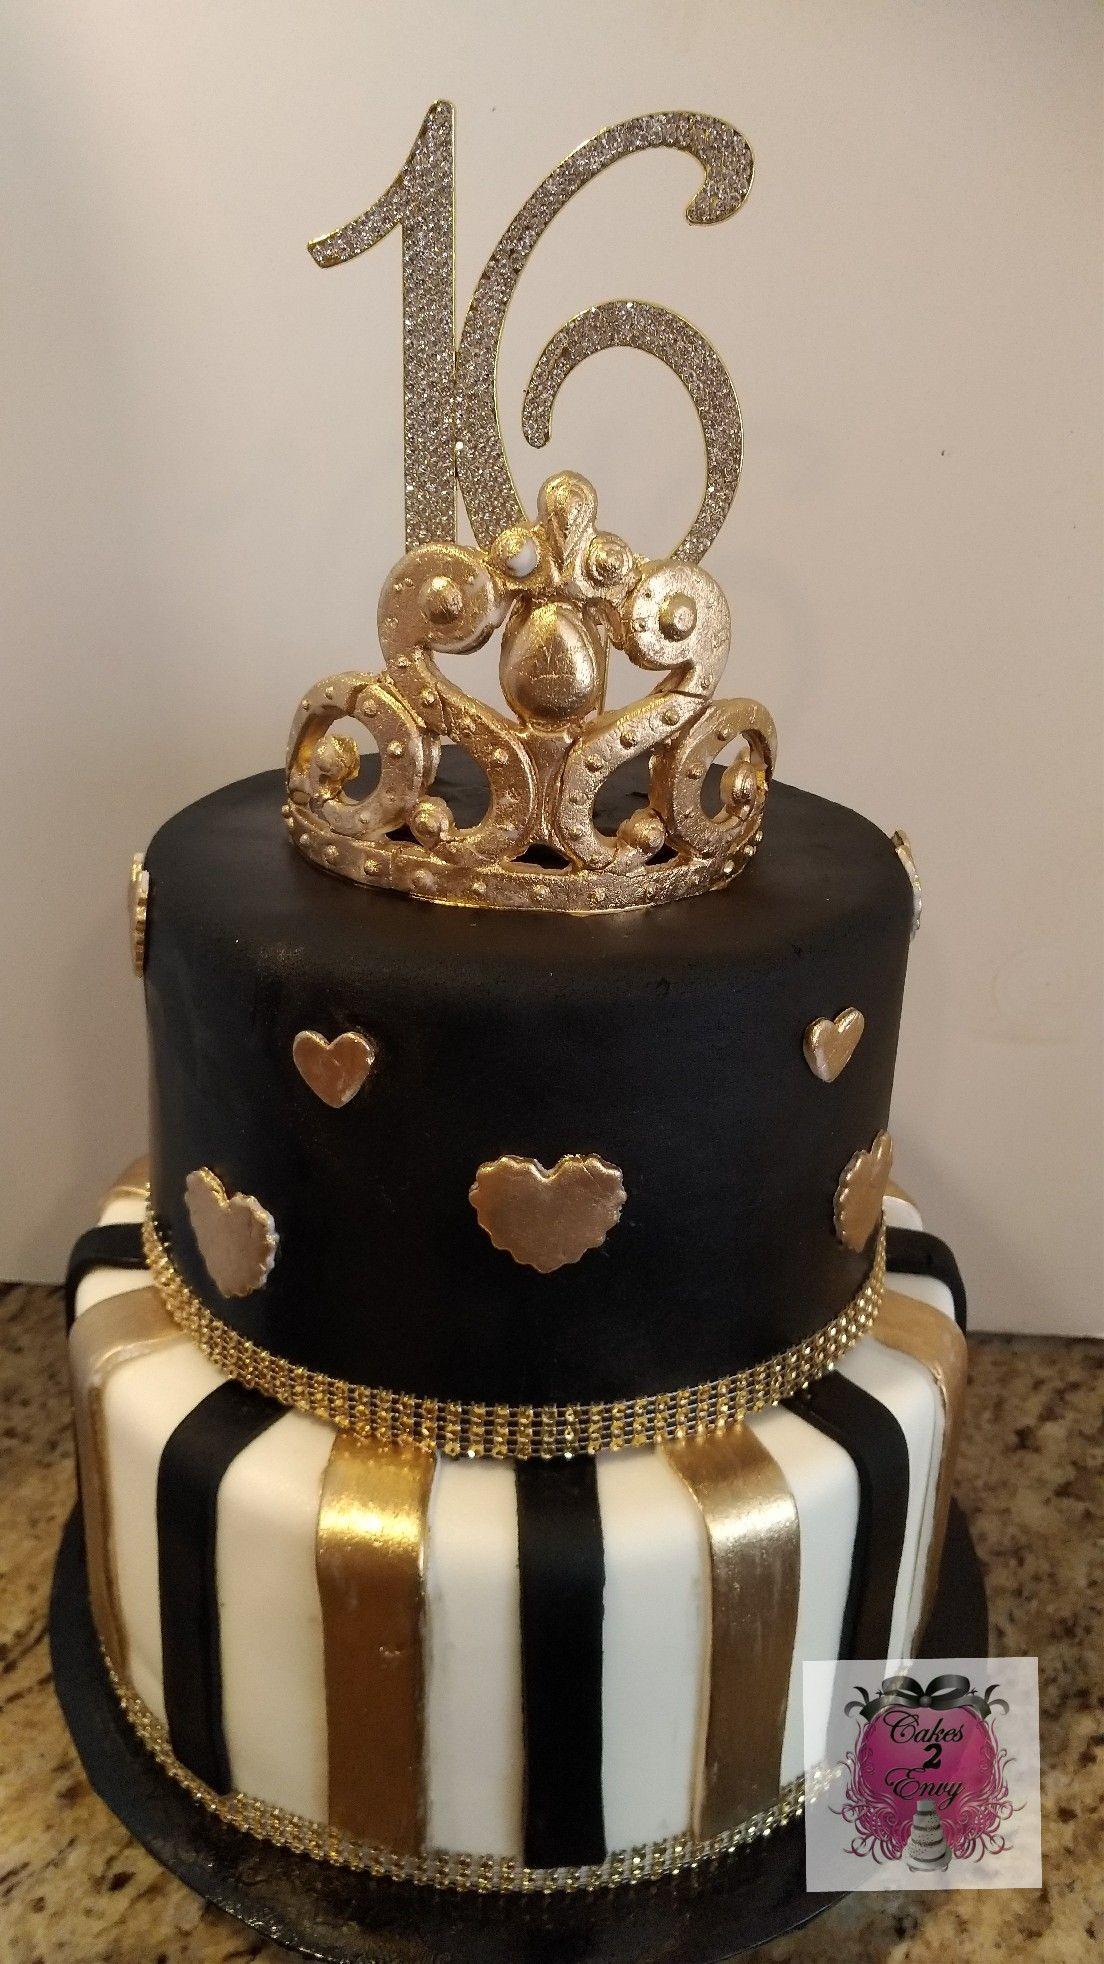 Black Gold Sweet 16 Cake Www Cakes2envy Com Sweet 16 Cakes